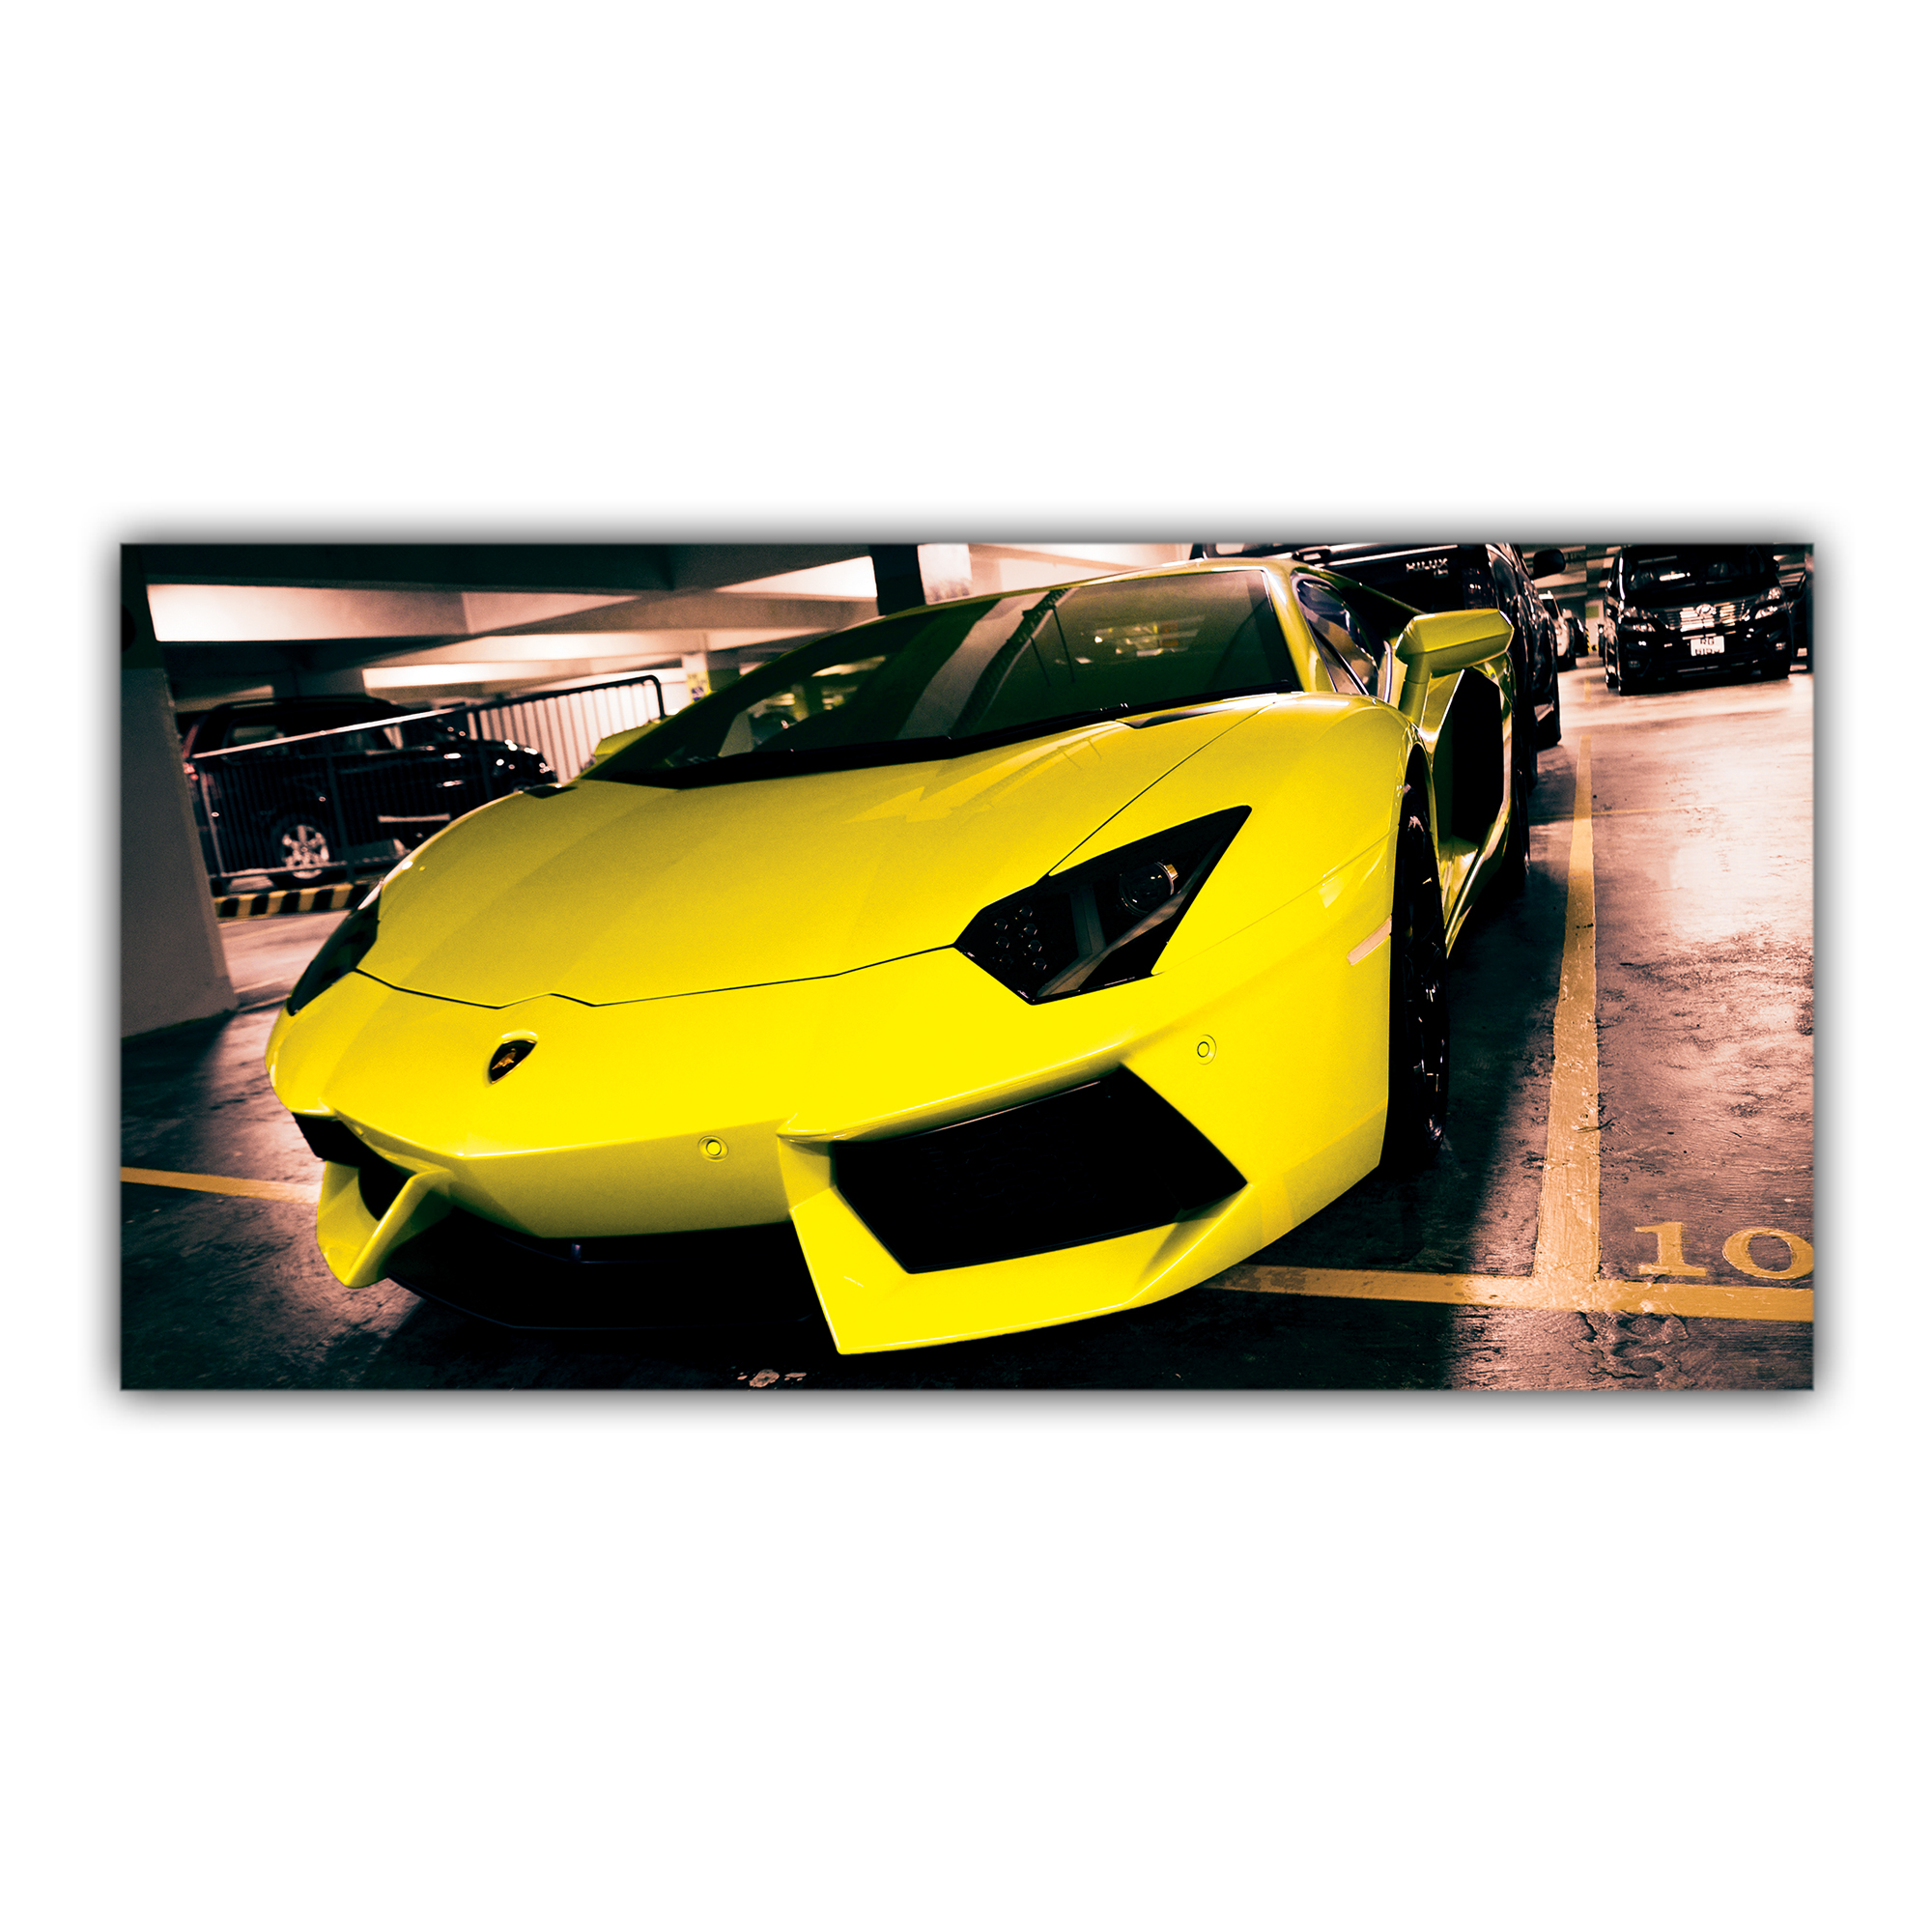 Lamborghini Aventador Jaune sport coupé